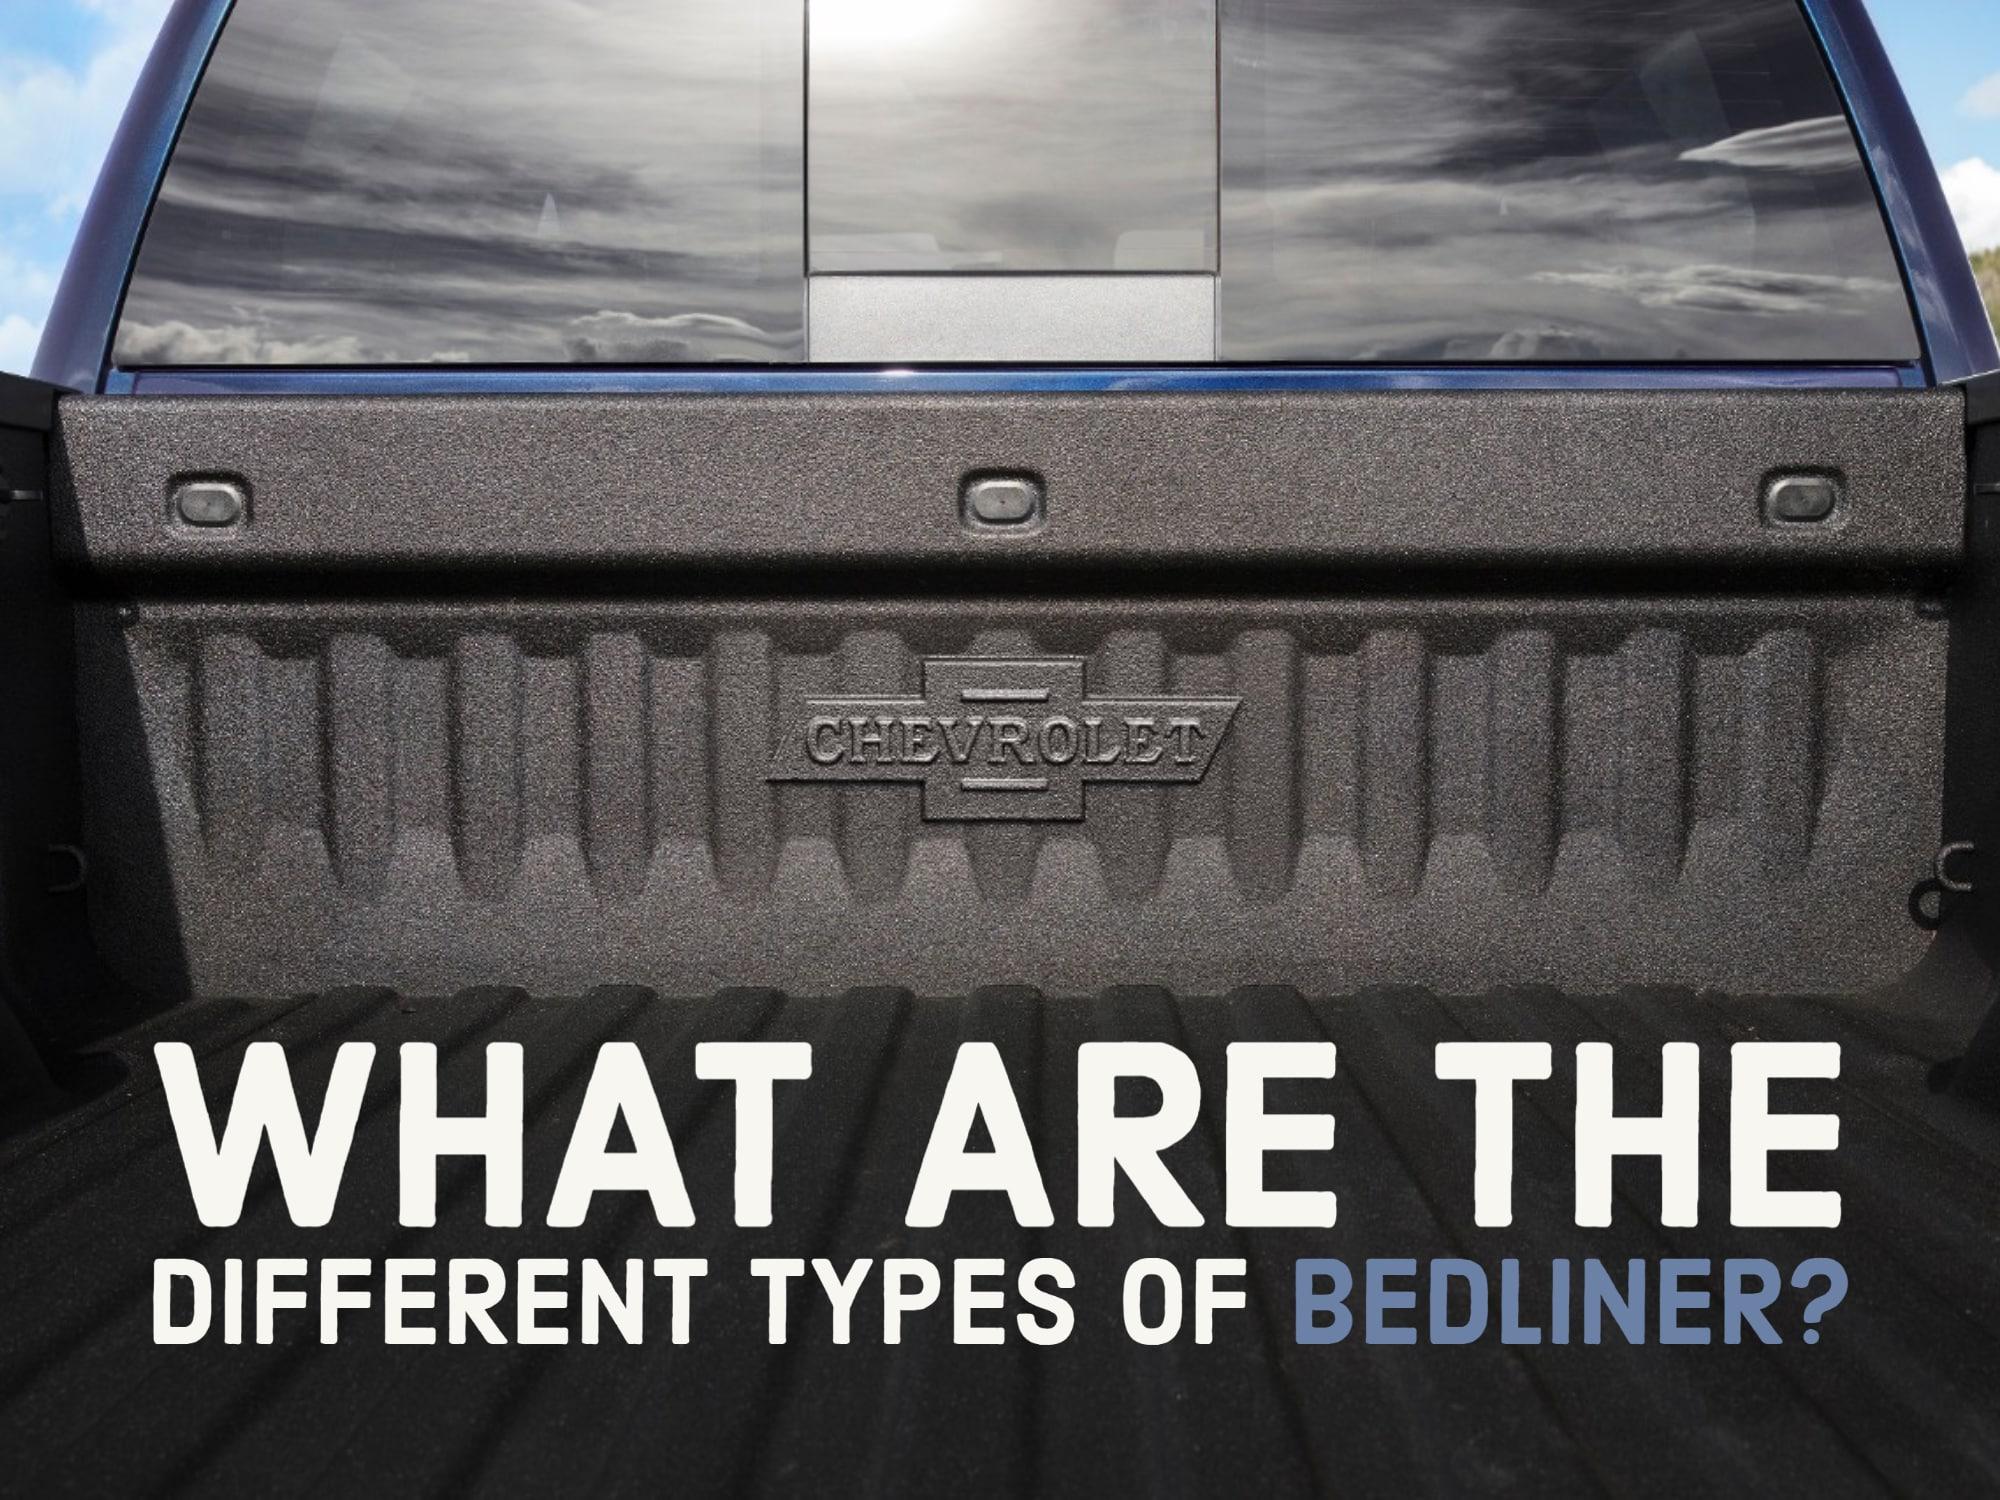 Chevrolet truck bed open with Chevrolet Heritage logo on bedliner